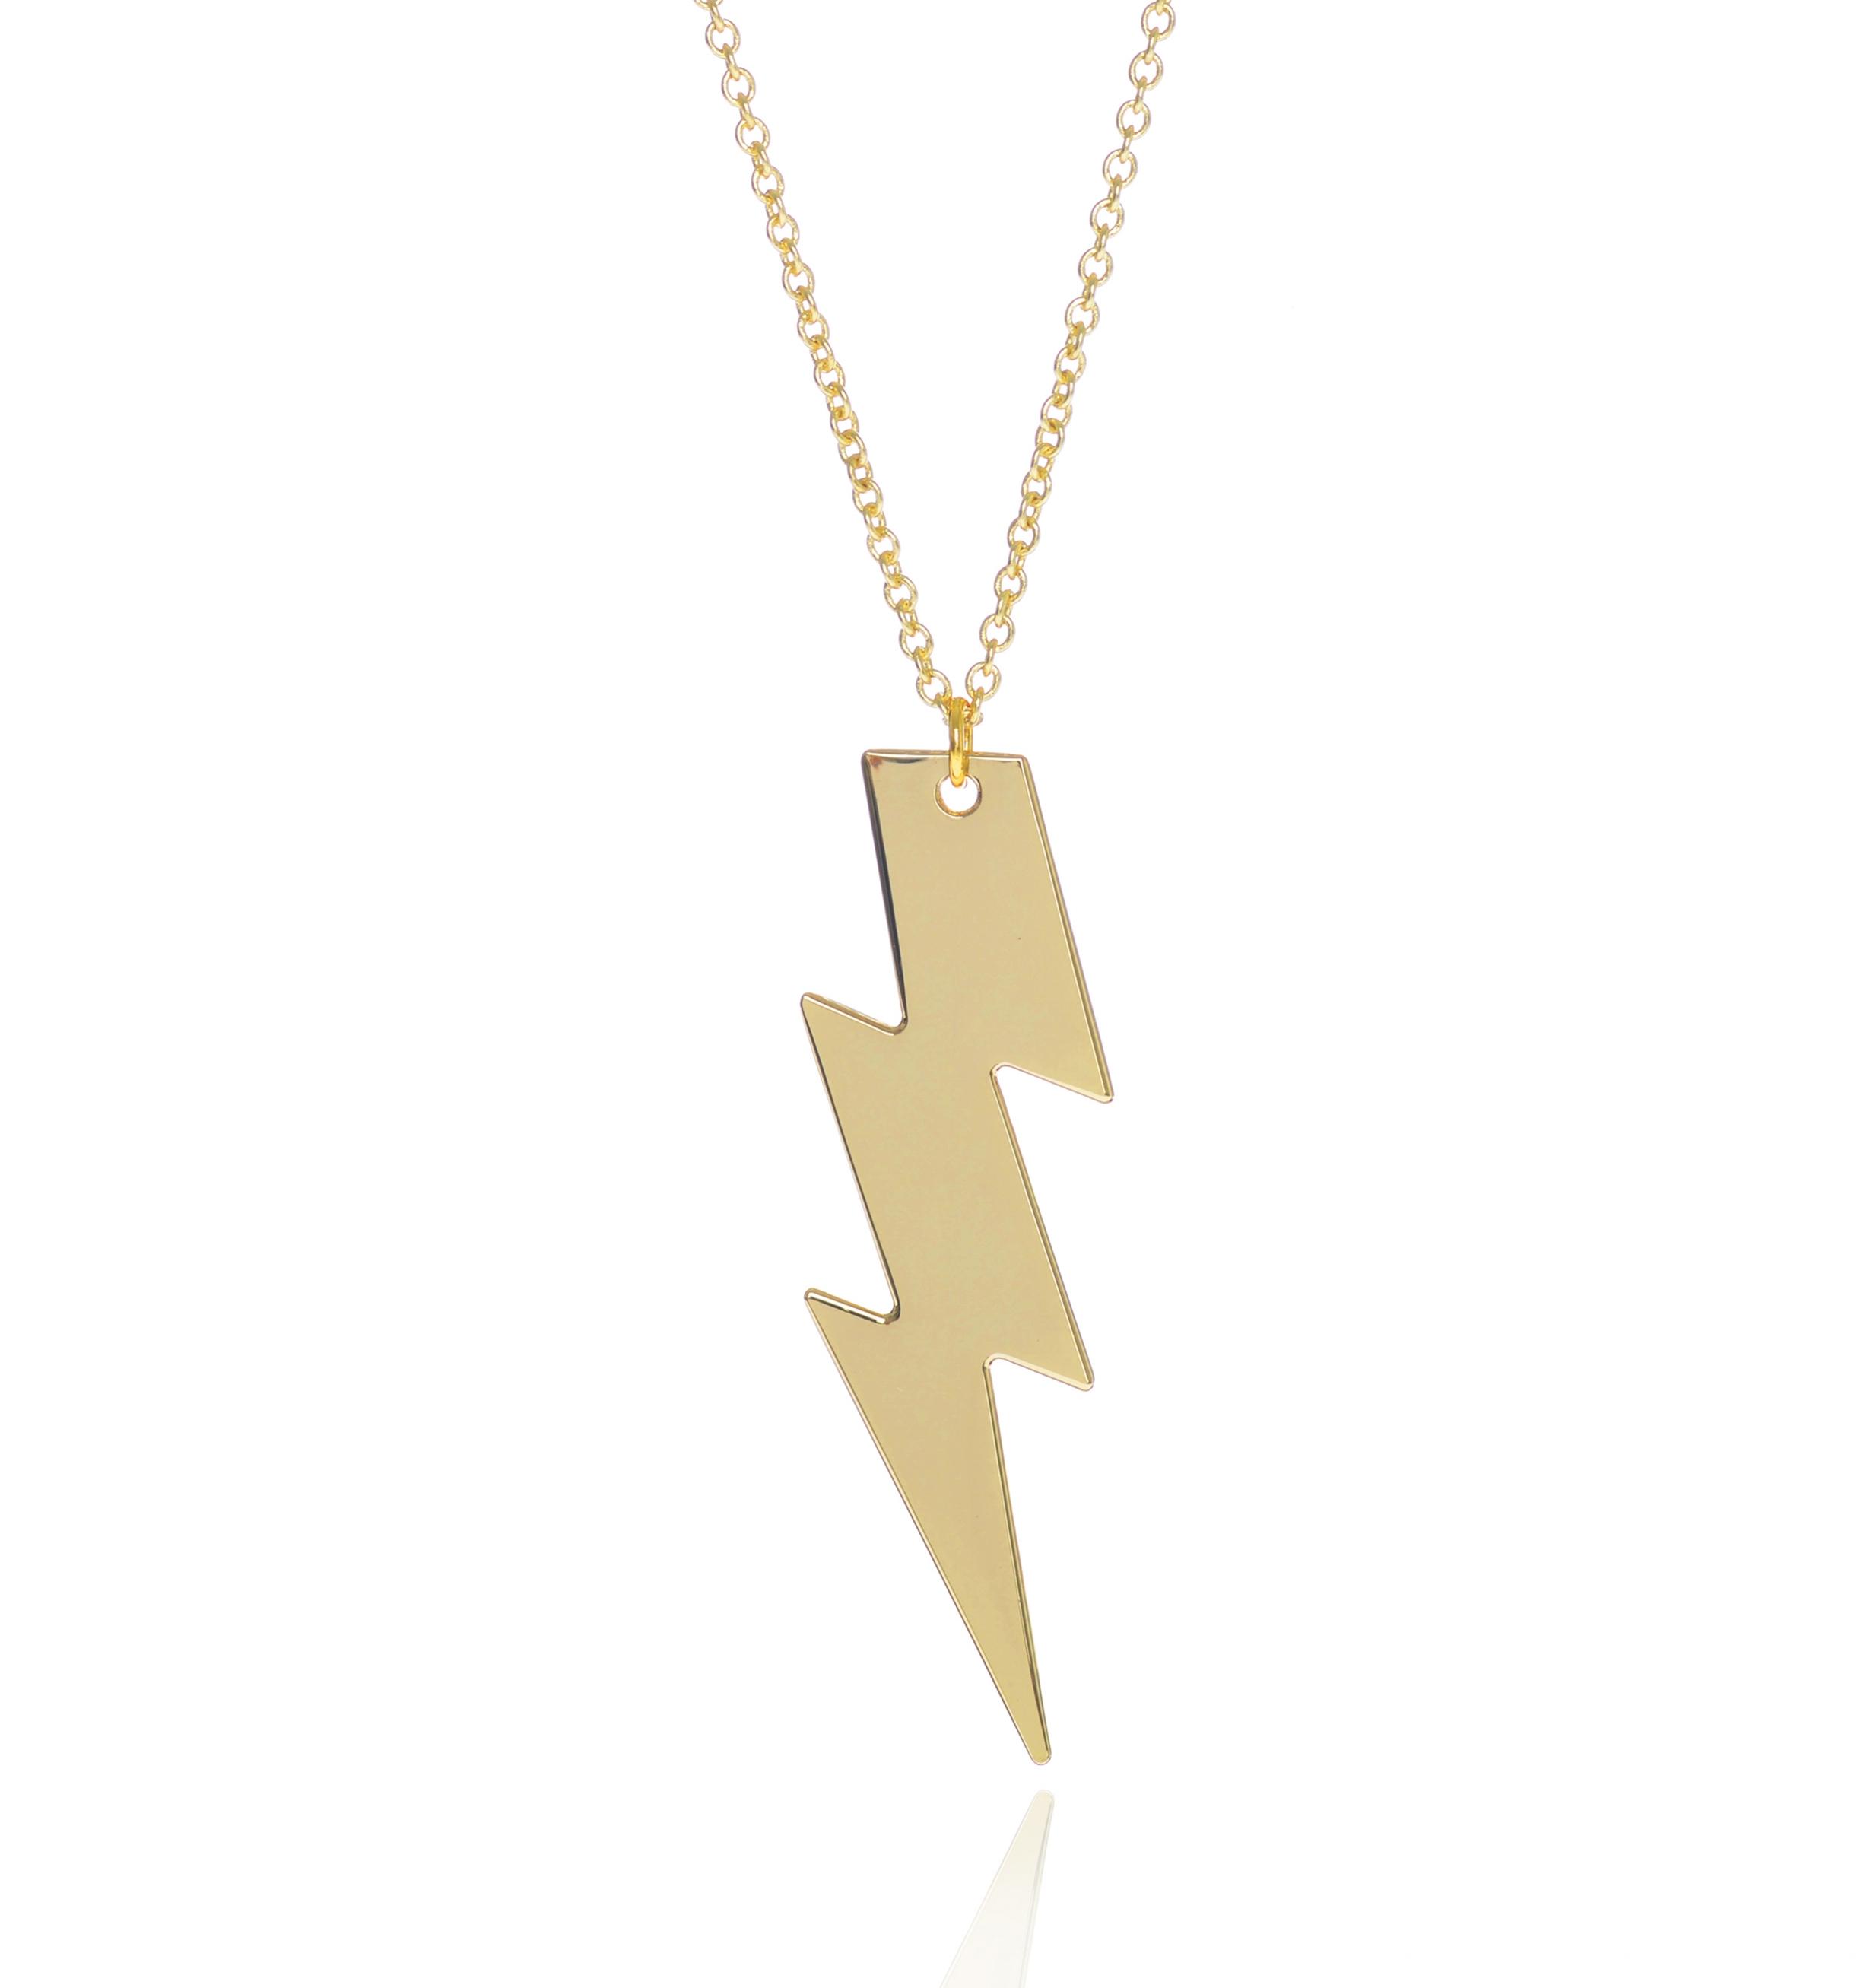 Cockatoo Lightening Bolt Necklace